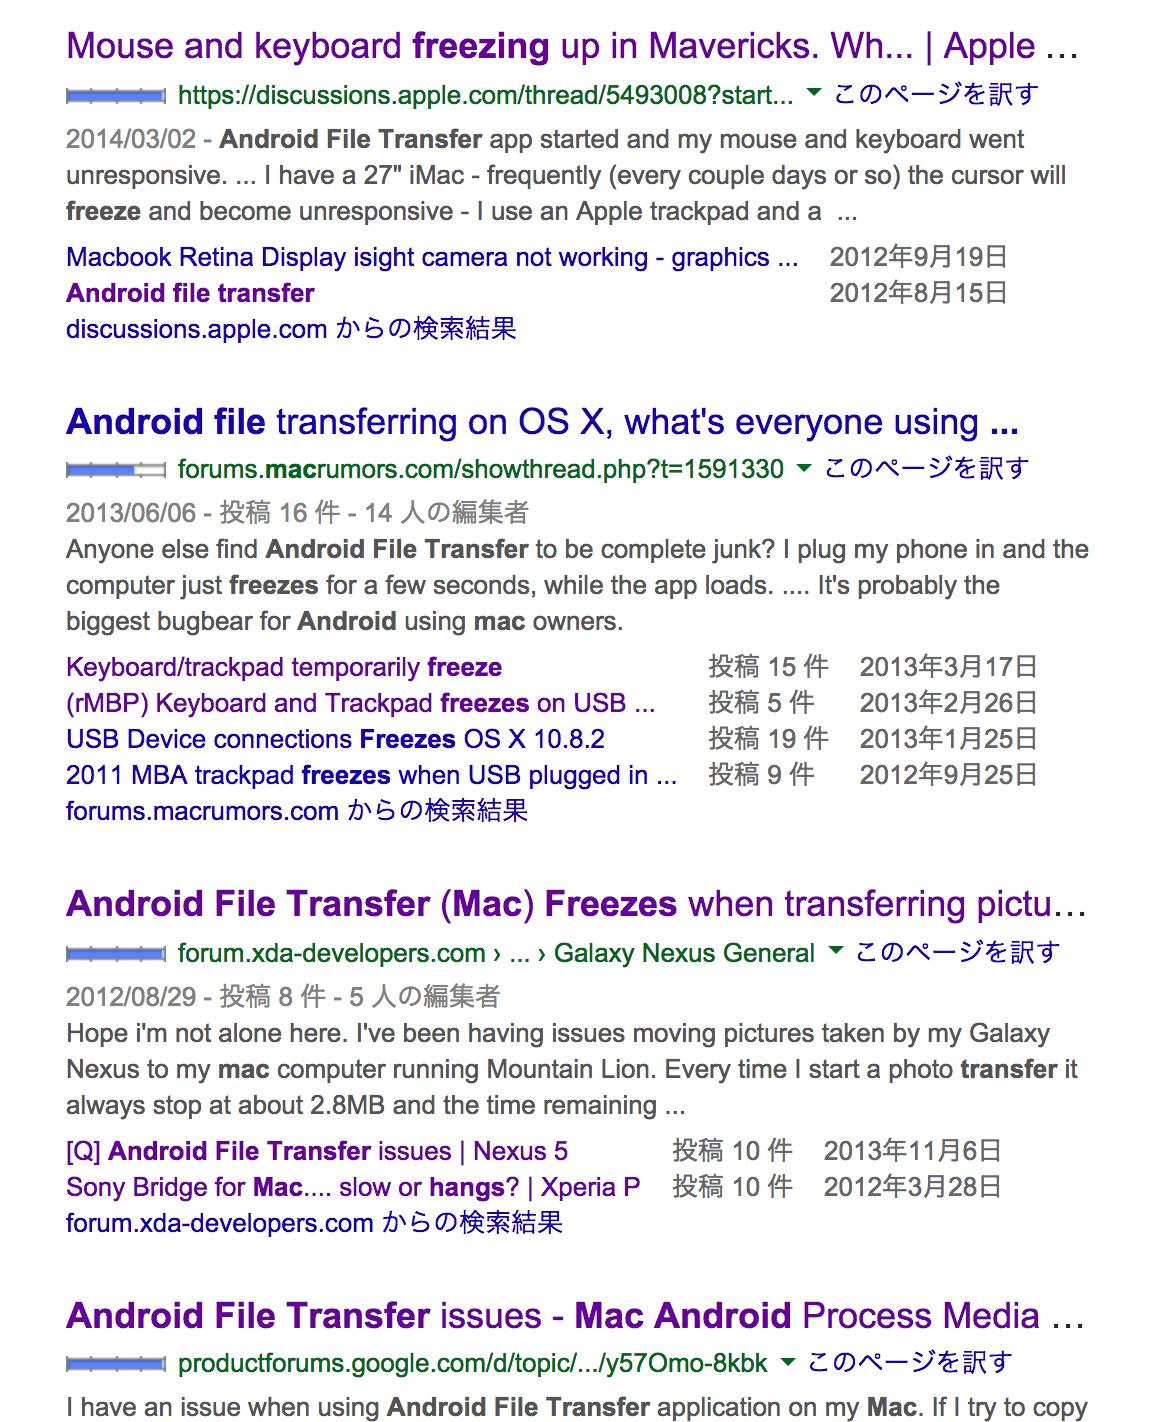 android_file_transfer_freeze_mac_-_Google_検索